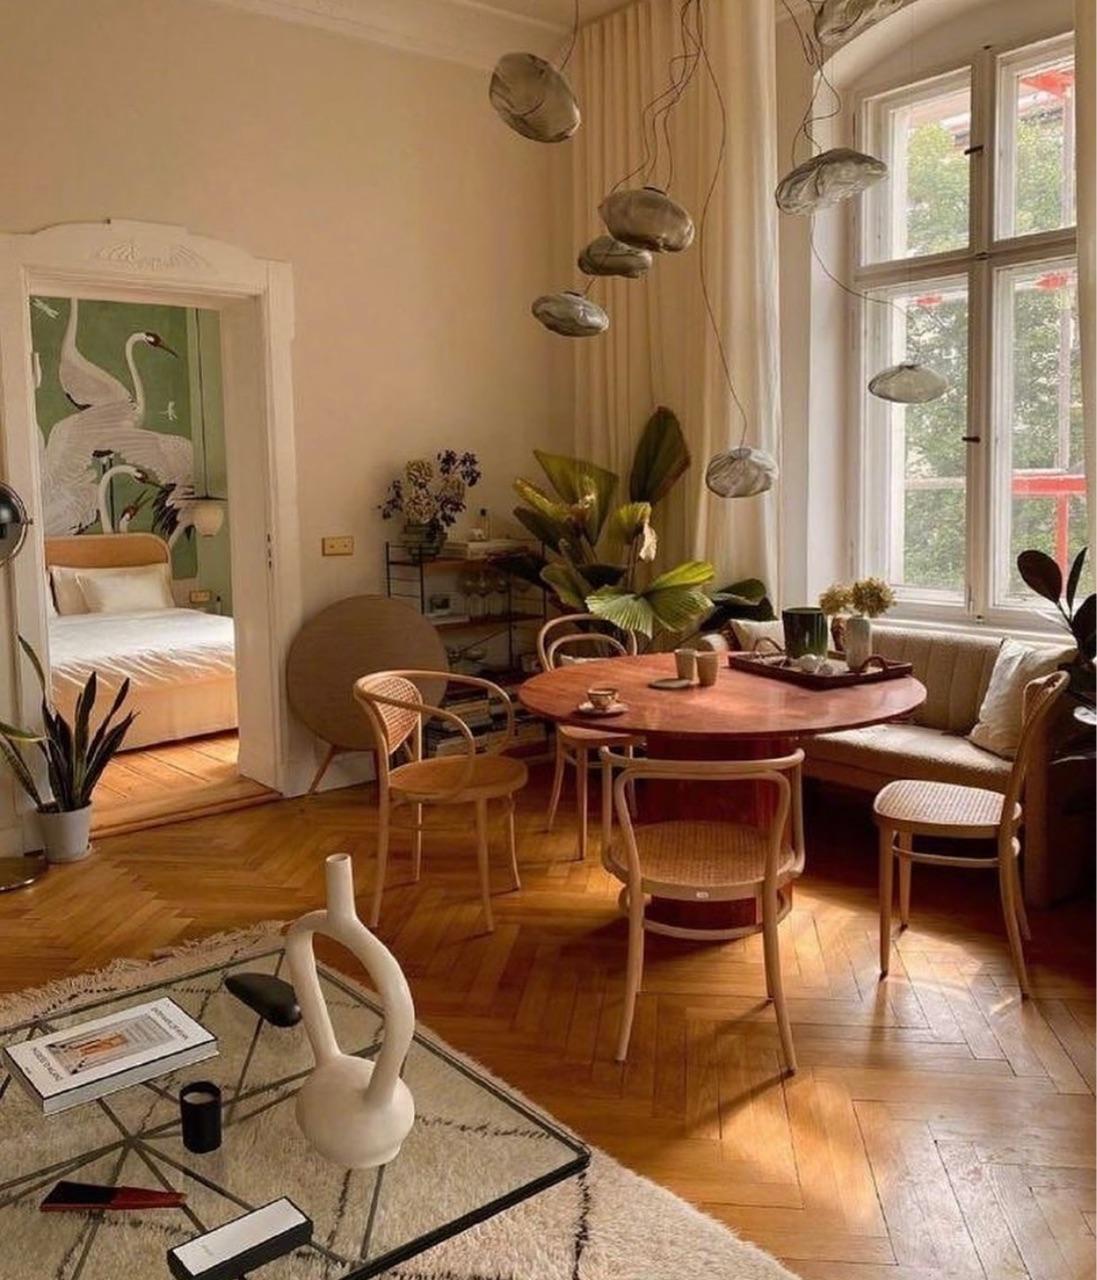 decor, Dream, and living image